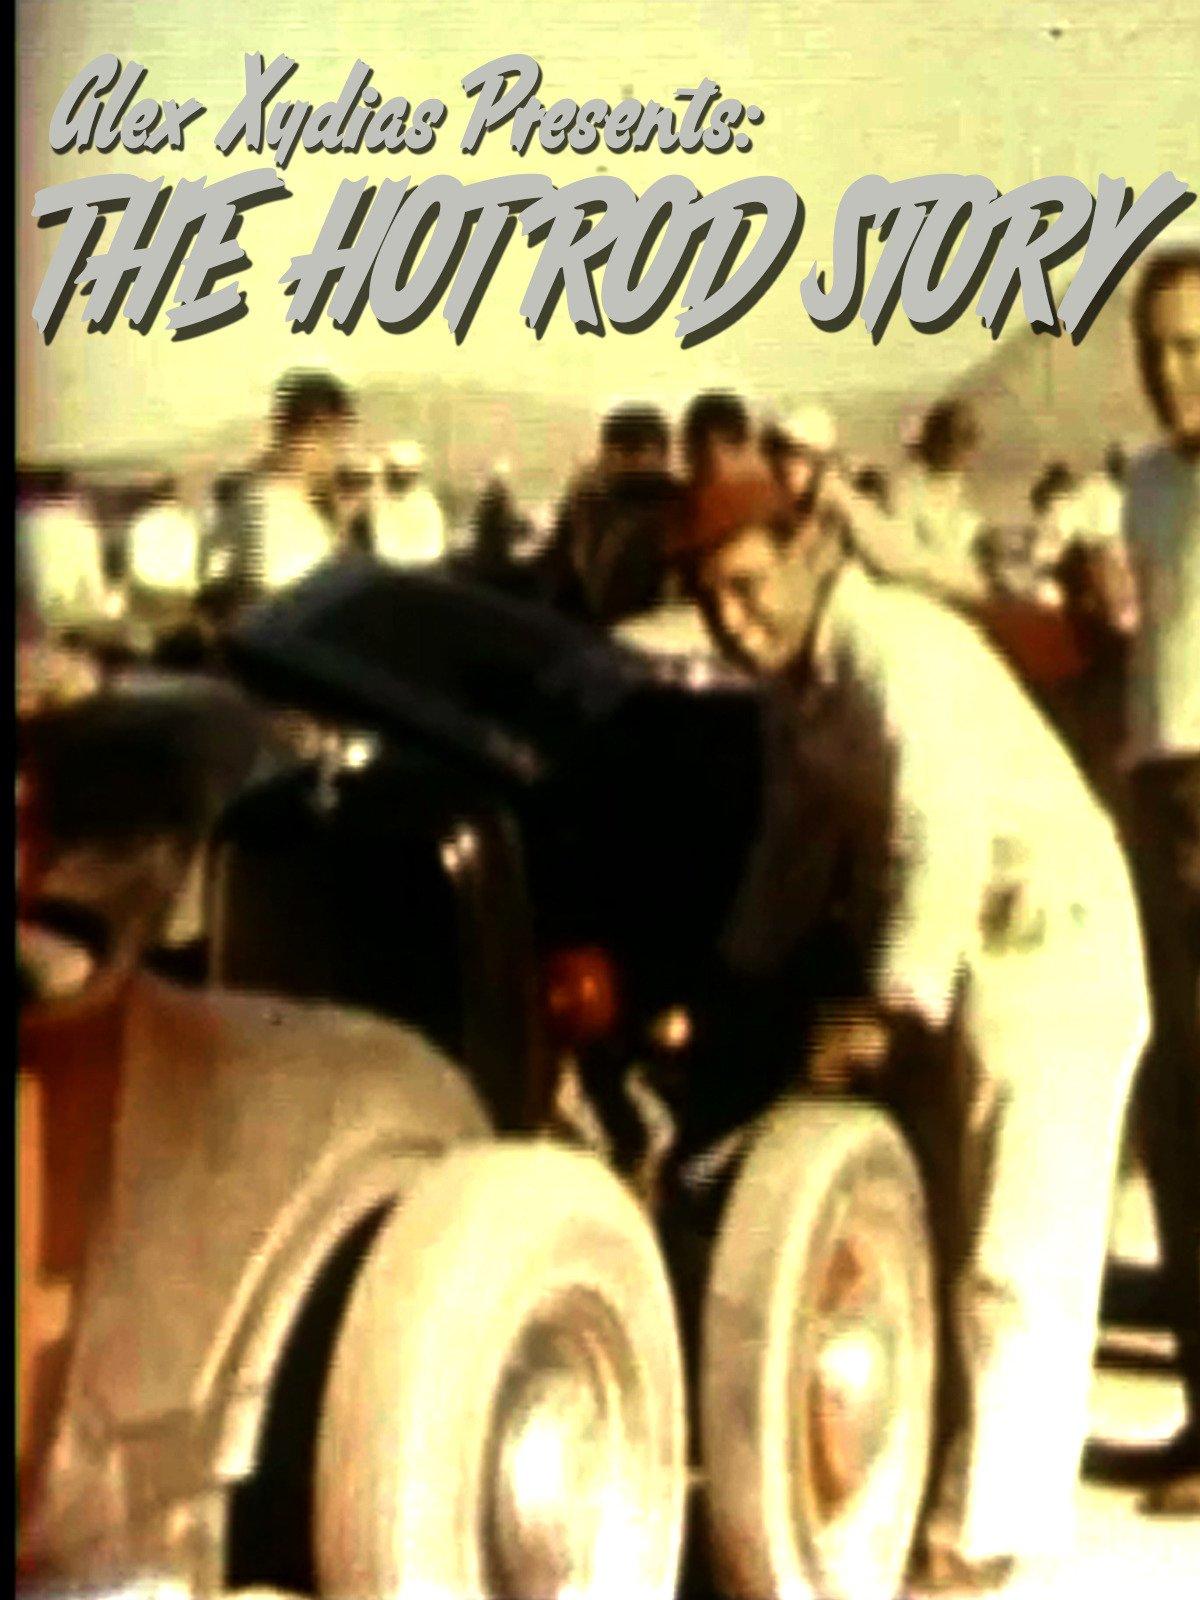 Alex Xydias Presents: The Hot Rod Story on Amazon Prime Video UK